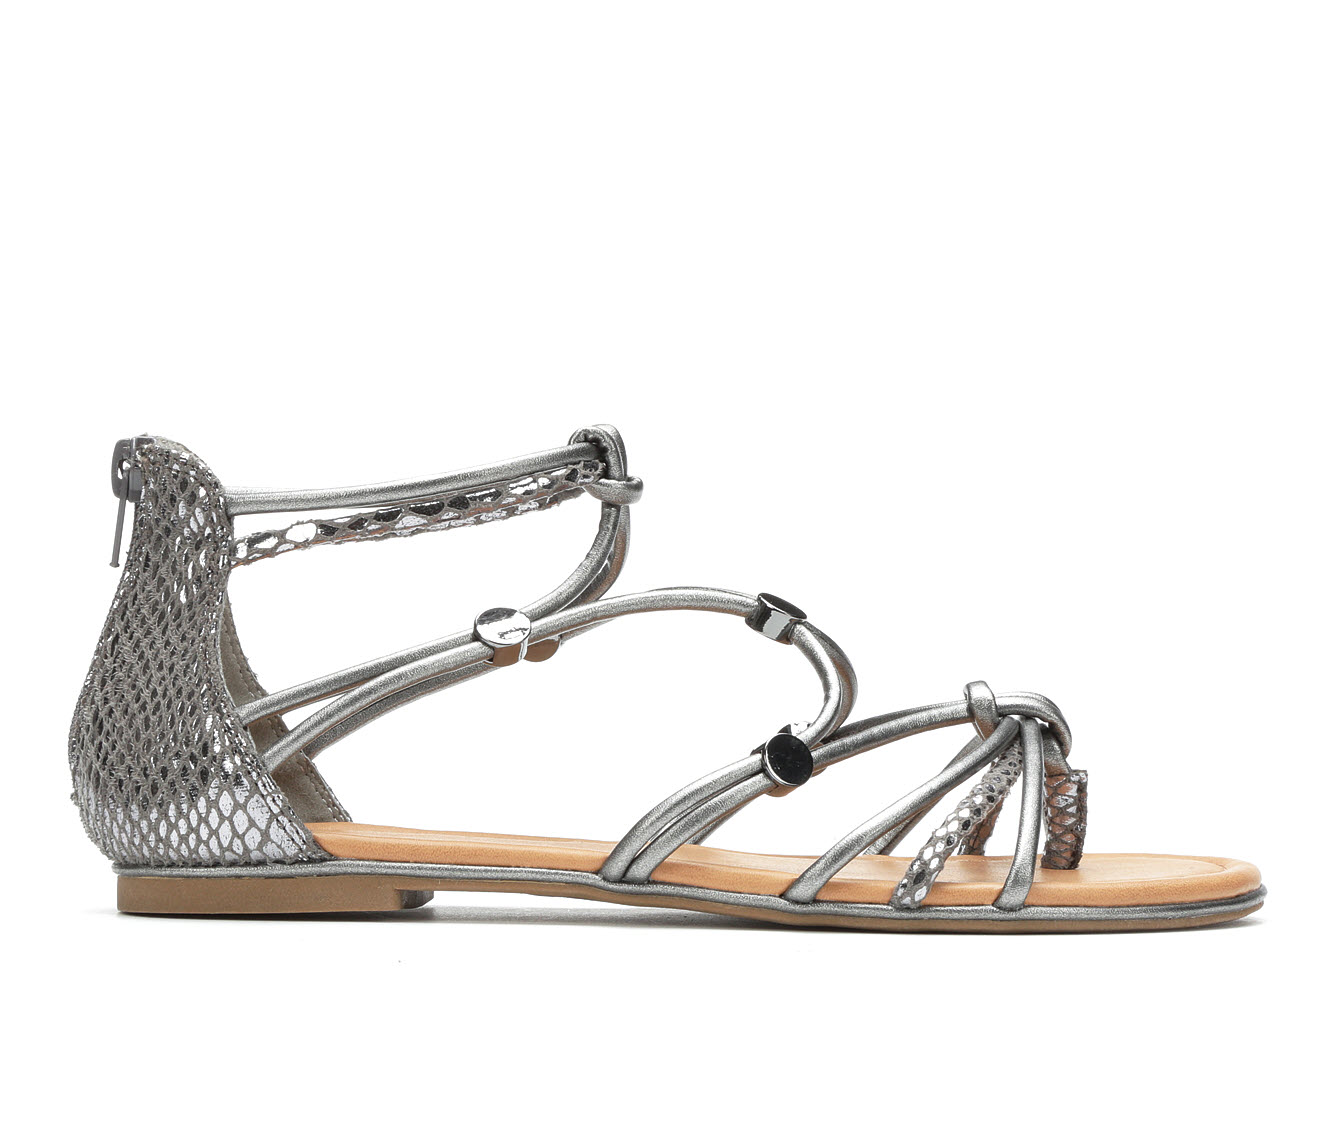 Andiamo Bright Women's Sandal (Gray Faux Leather)